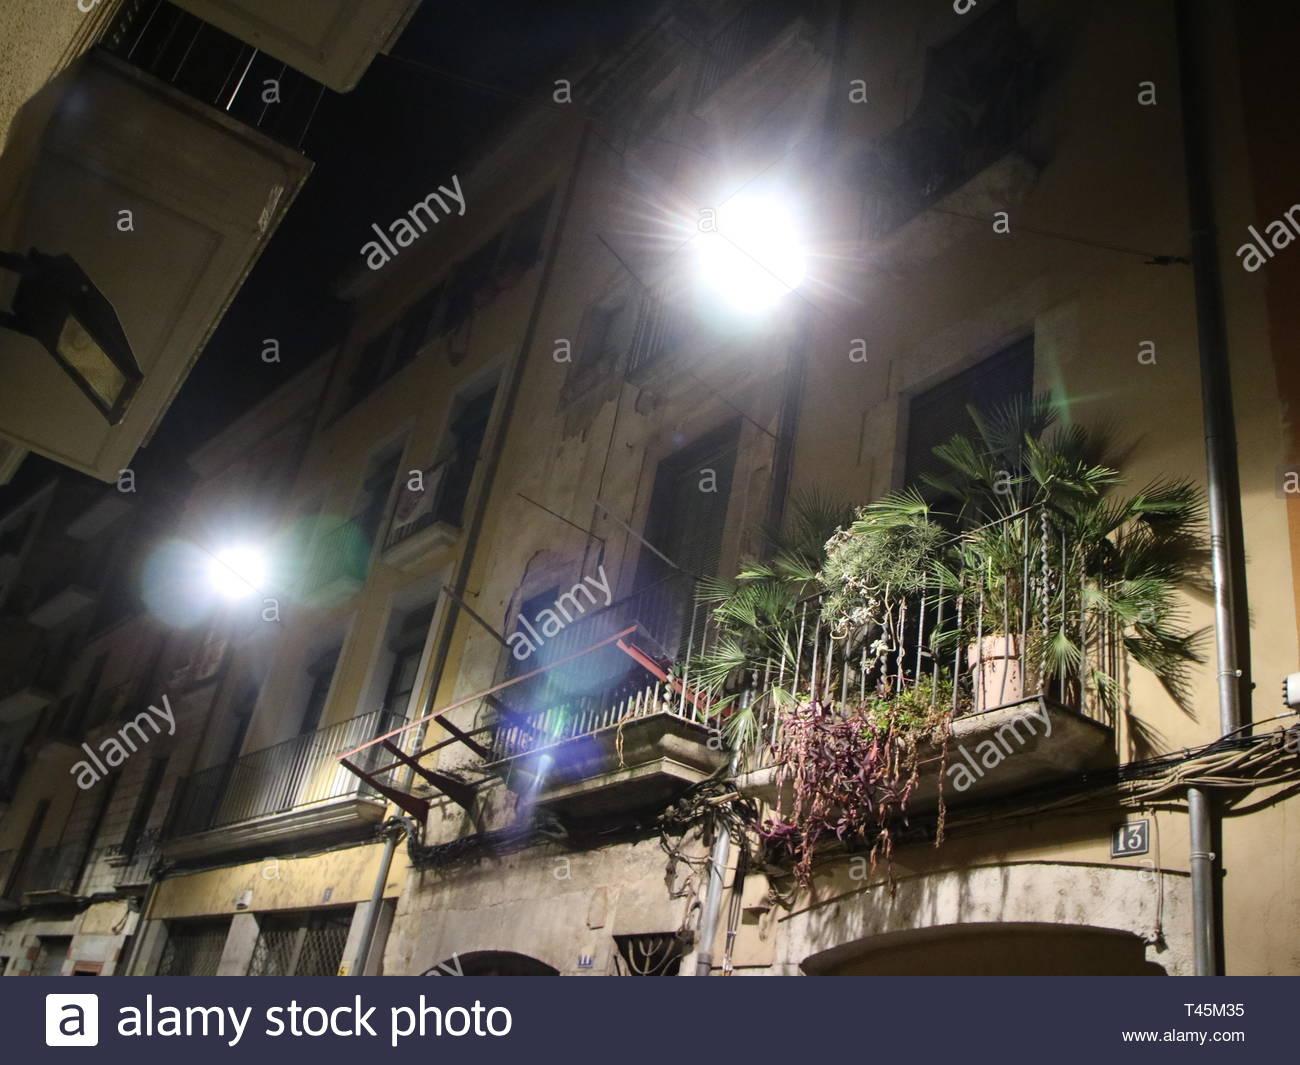 Balcony Garden at Night in Girona Spain - Stock Image